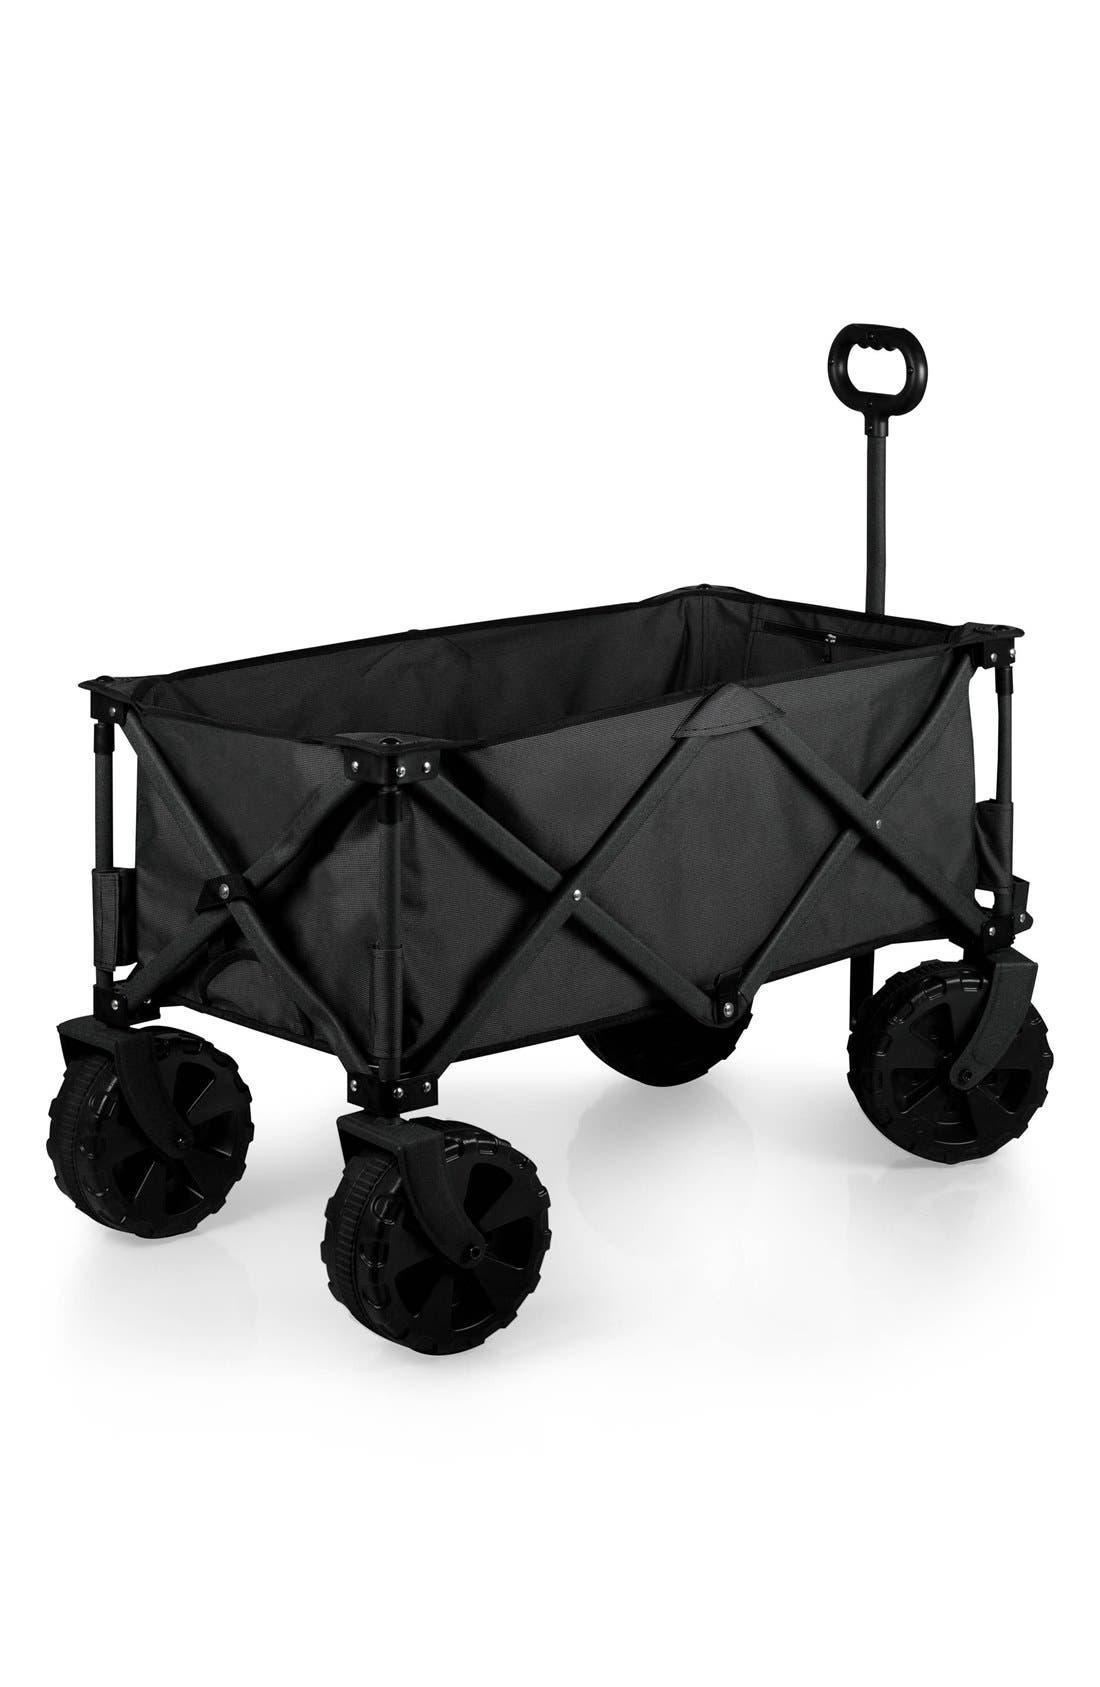 Main Image - Picnic Time All Terrain Adventure Wagon